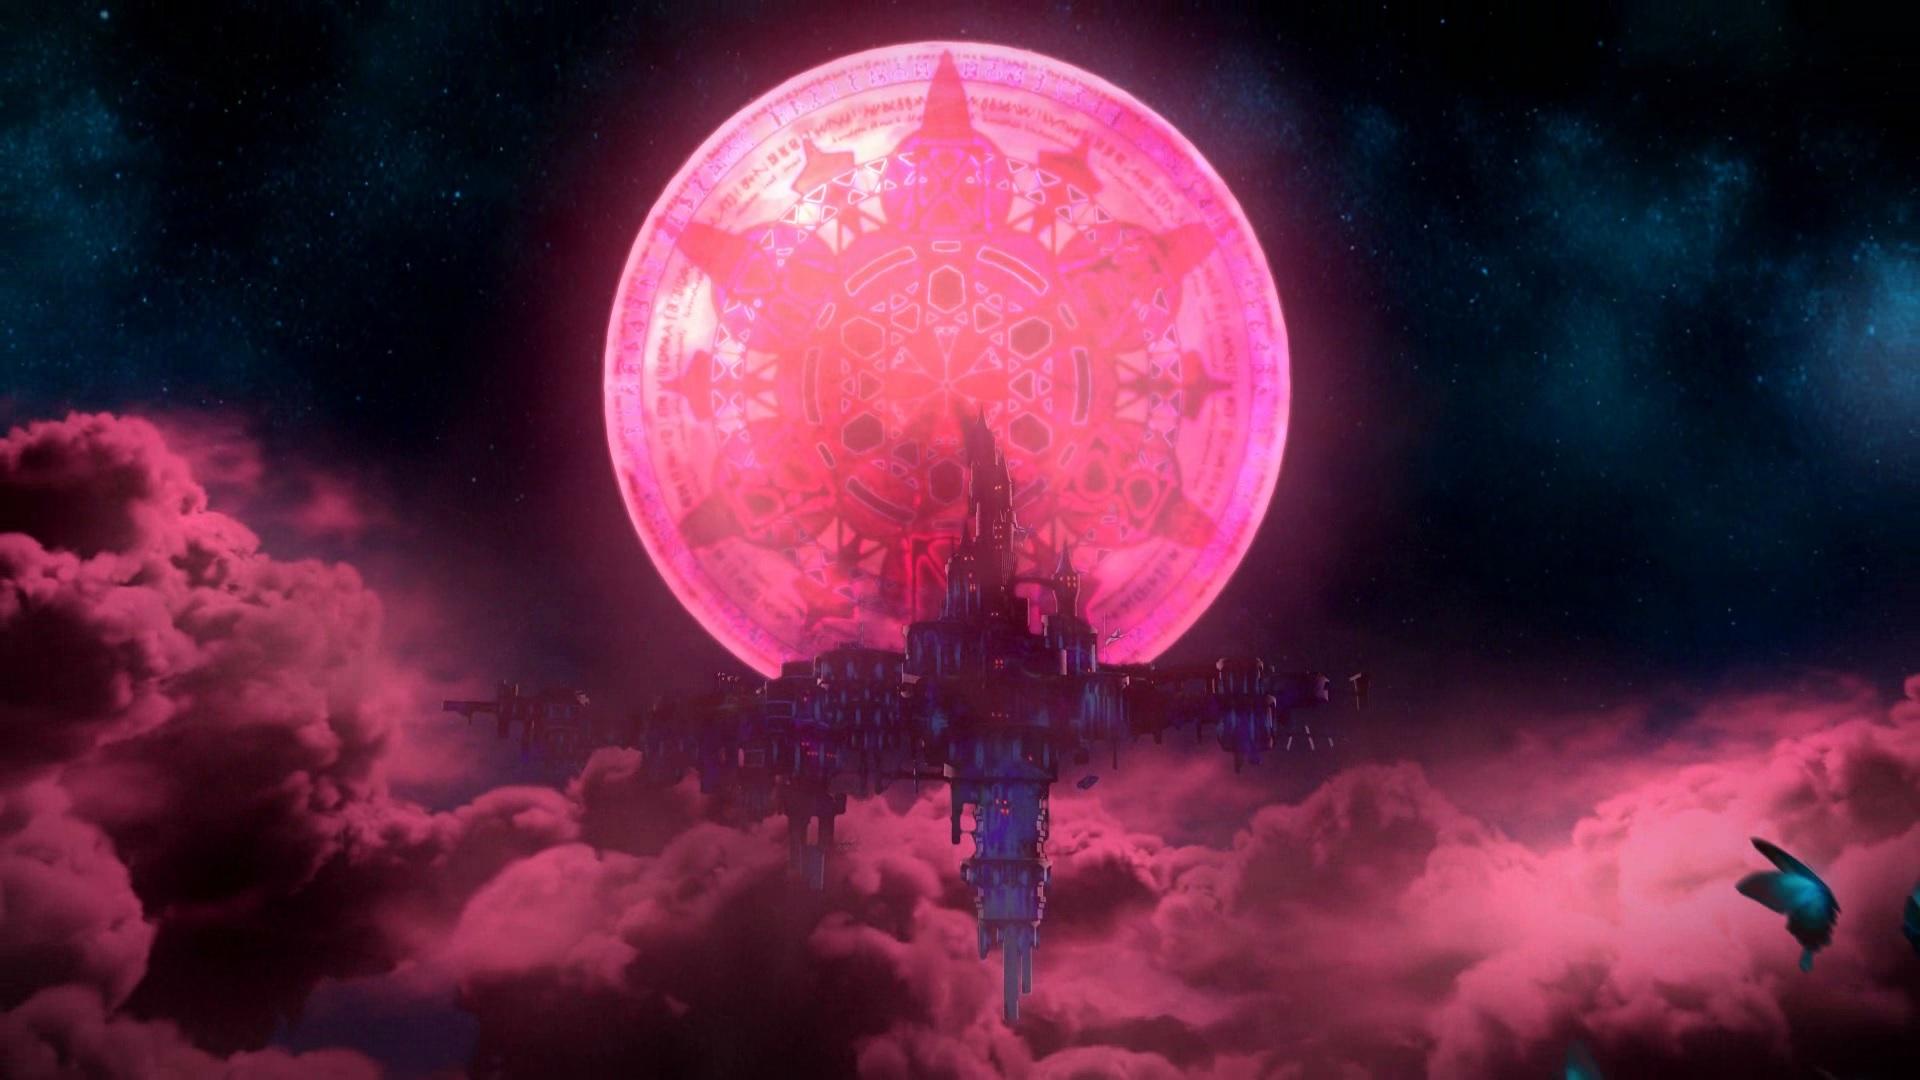 (Nights of Azure, Koei Tecmo)